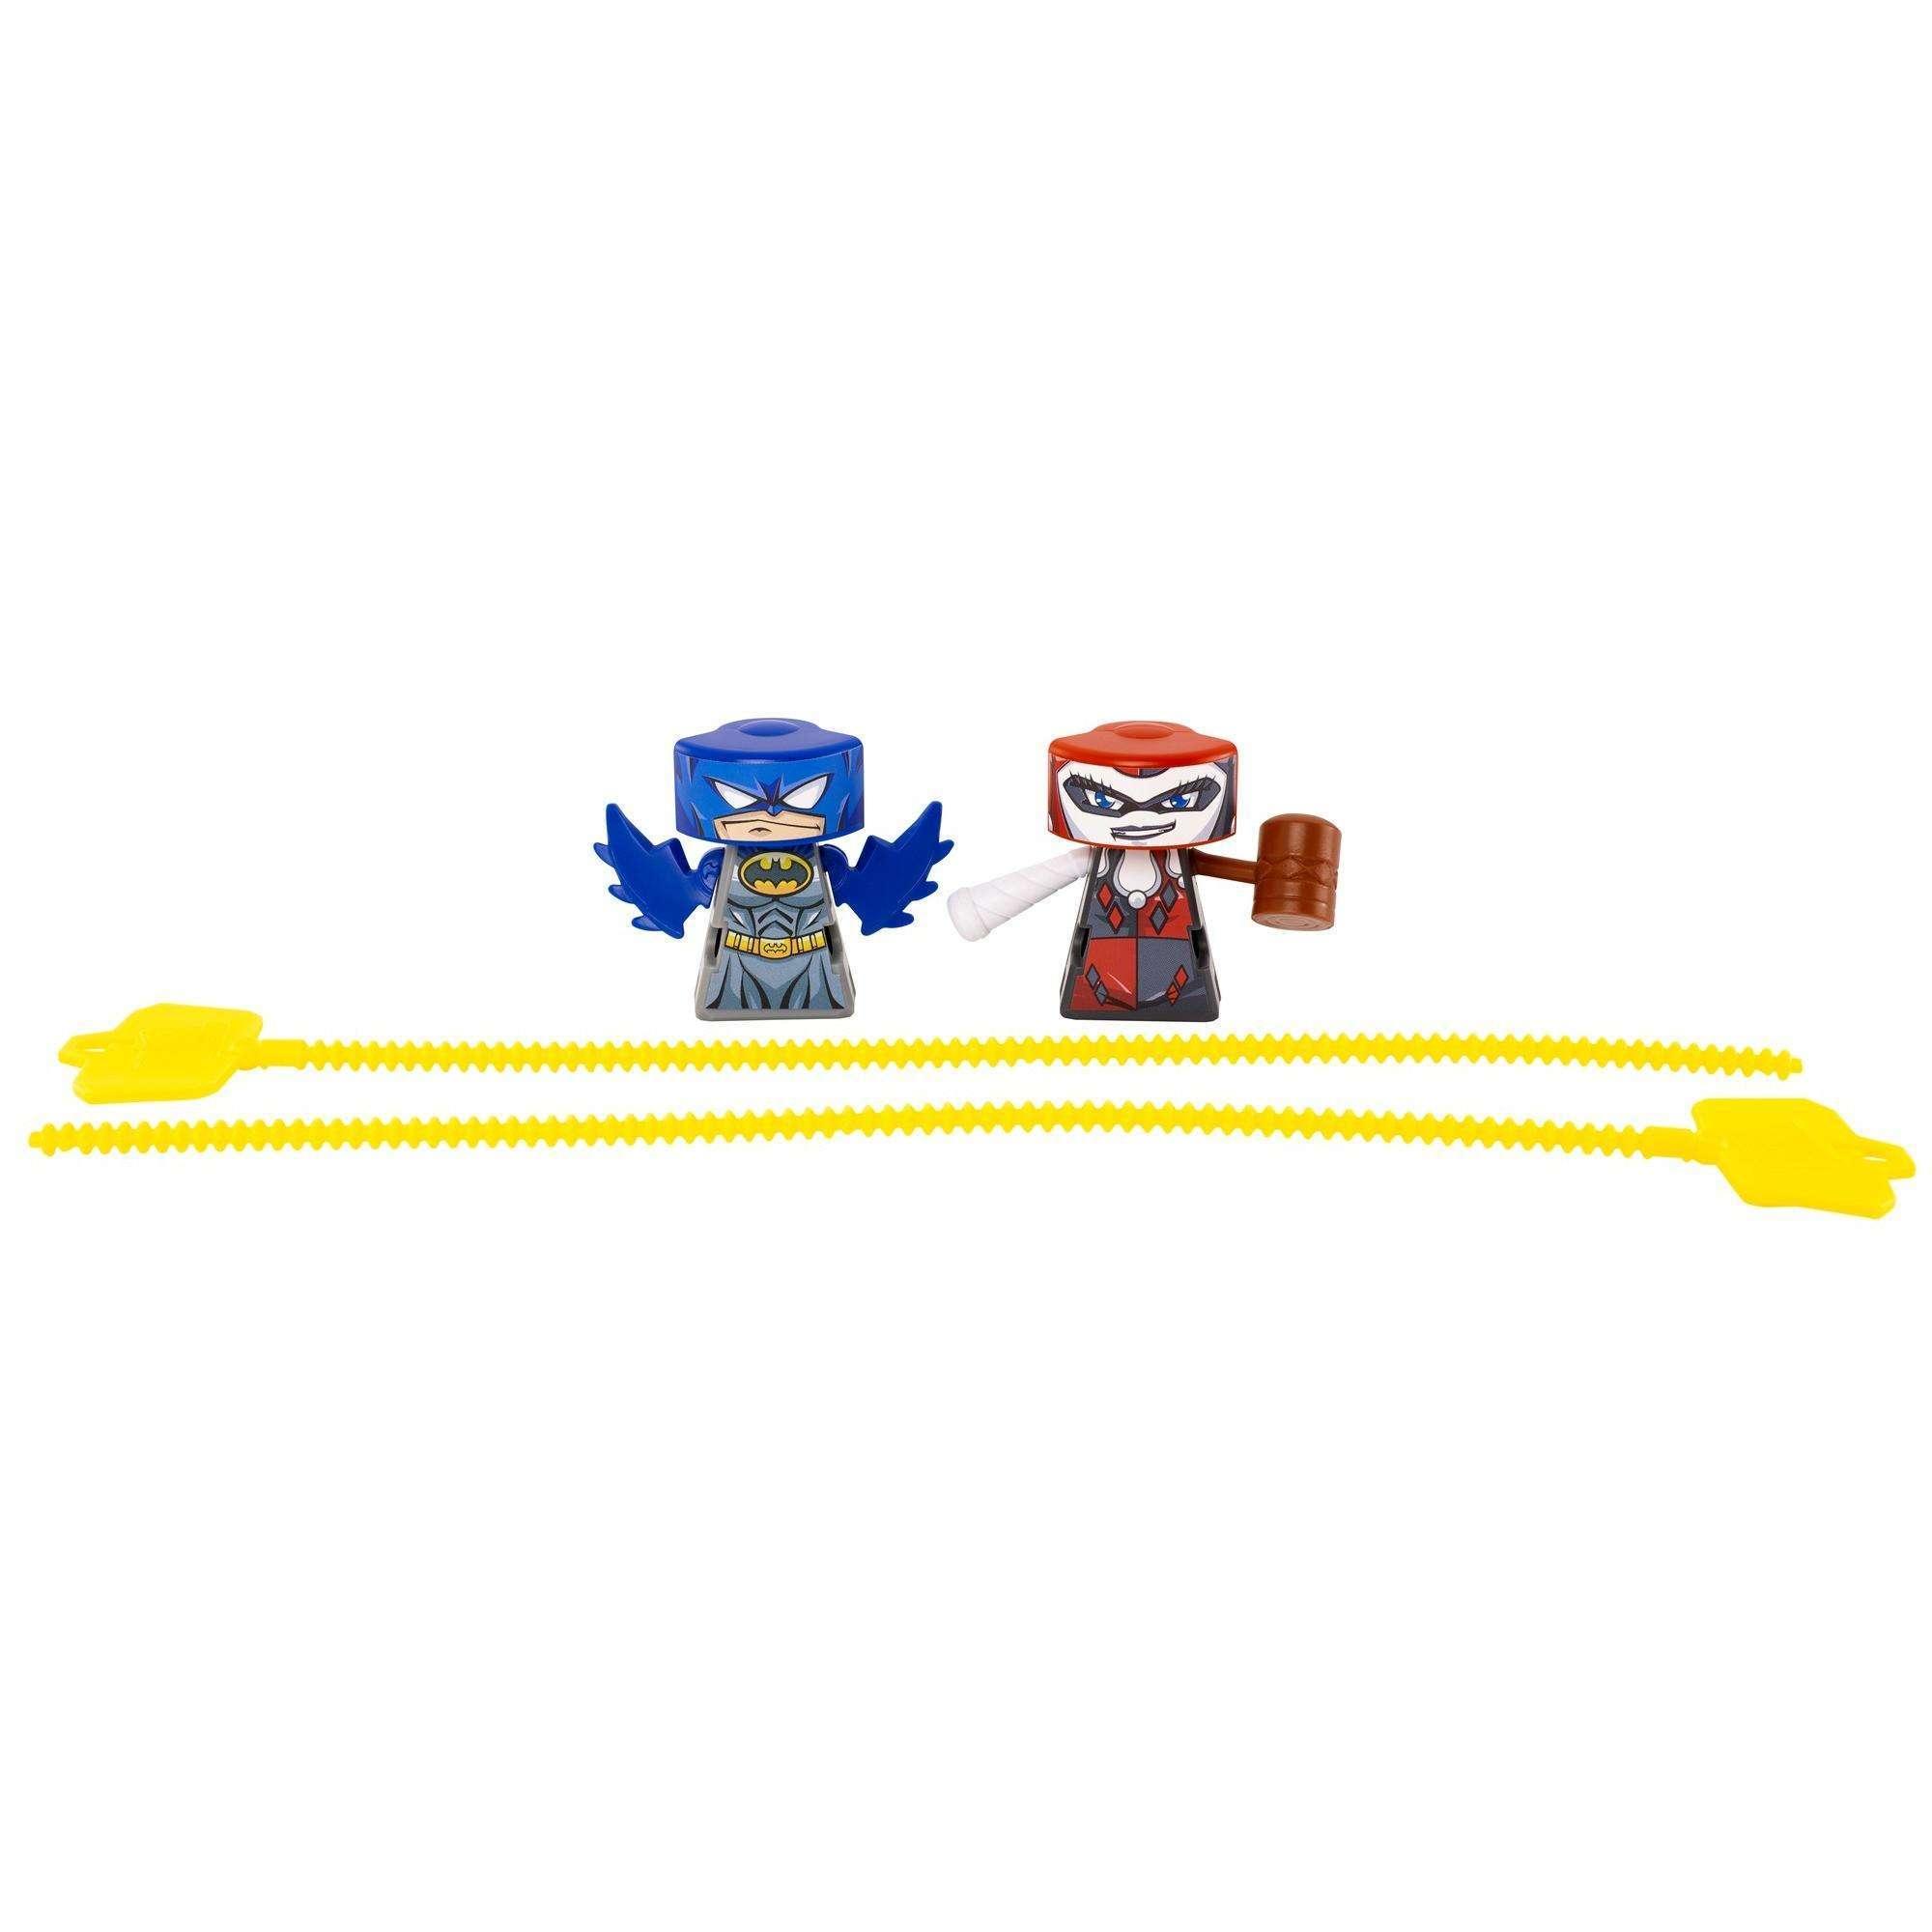 VS Rip-Spin Warriors Batman VS. Harley Quinn 2-Pack by Mattel